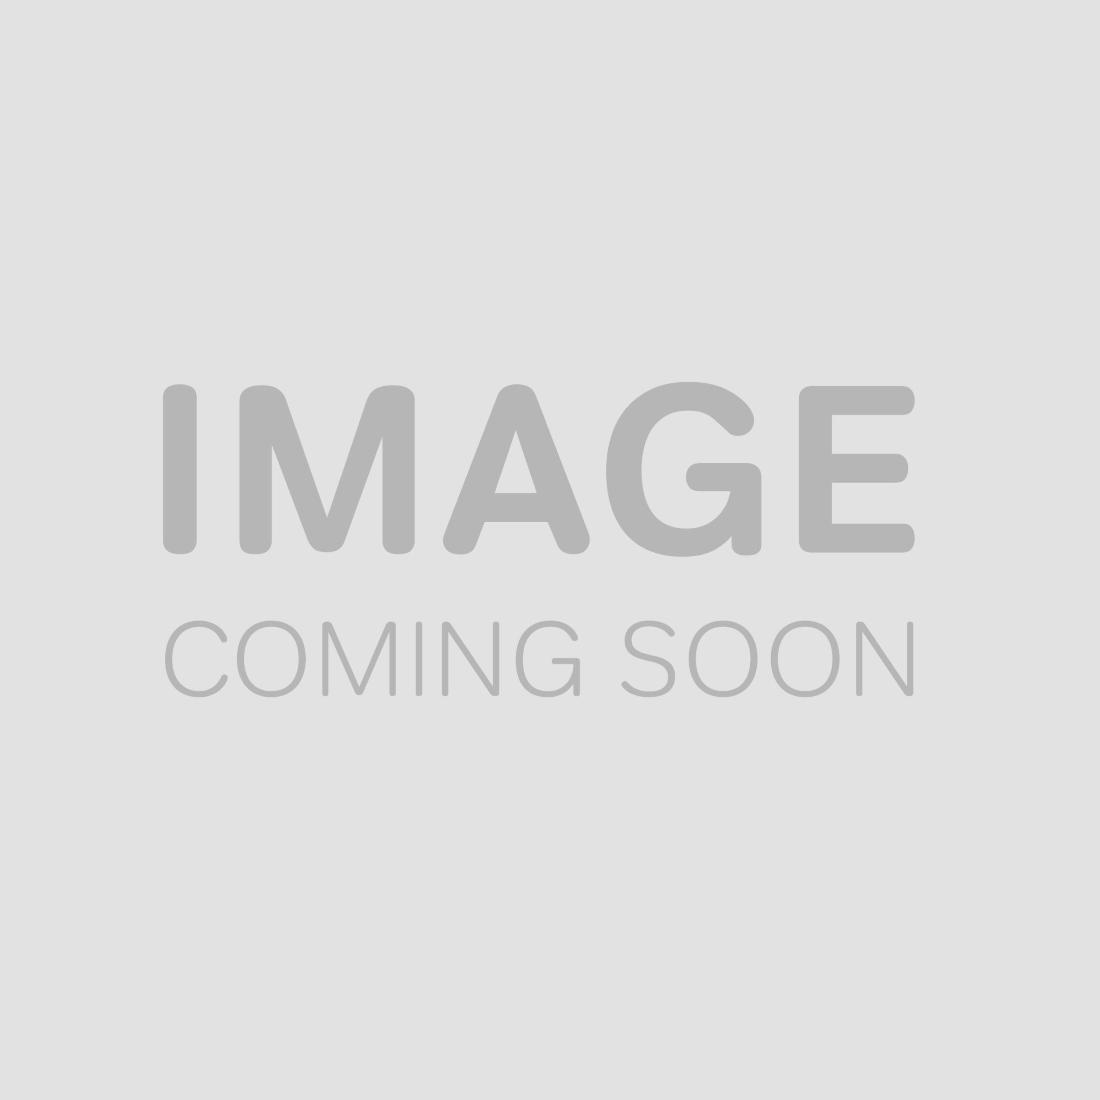 Padded Sling - Mesh - Keyhole Clip Fitting - X Large